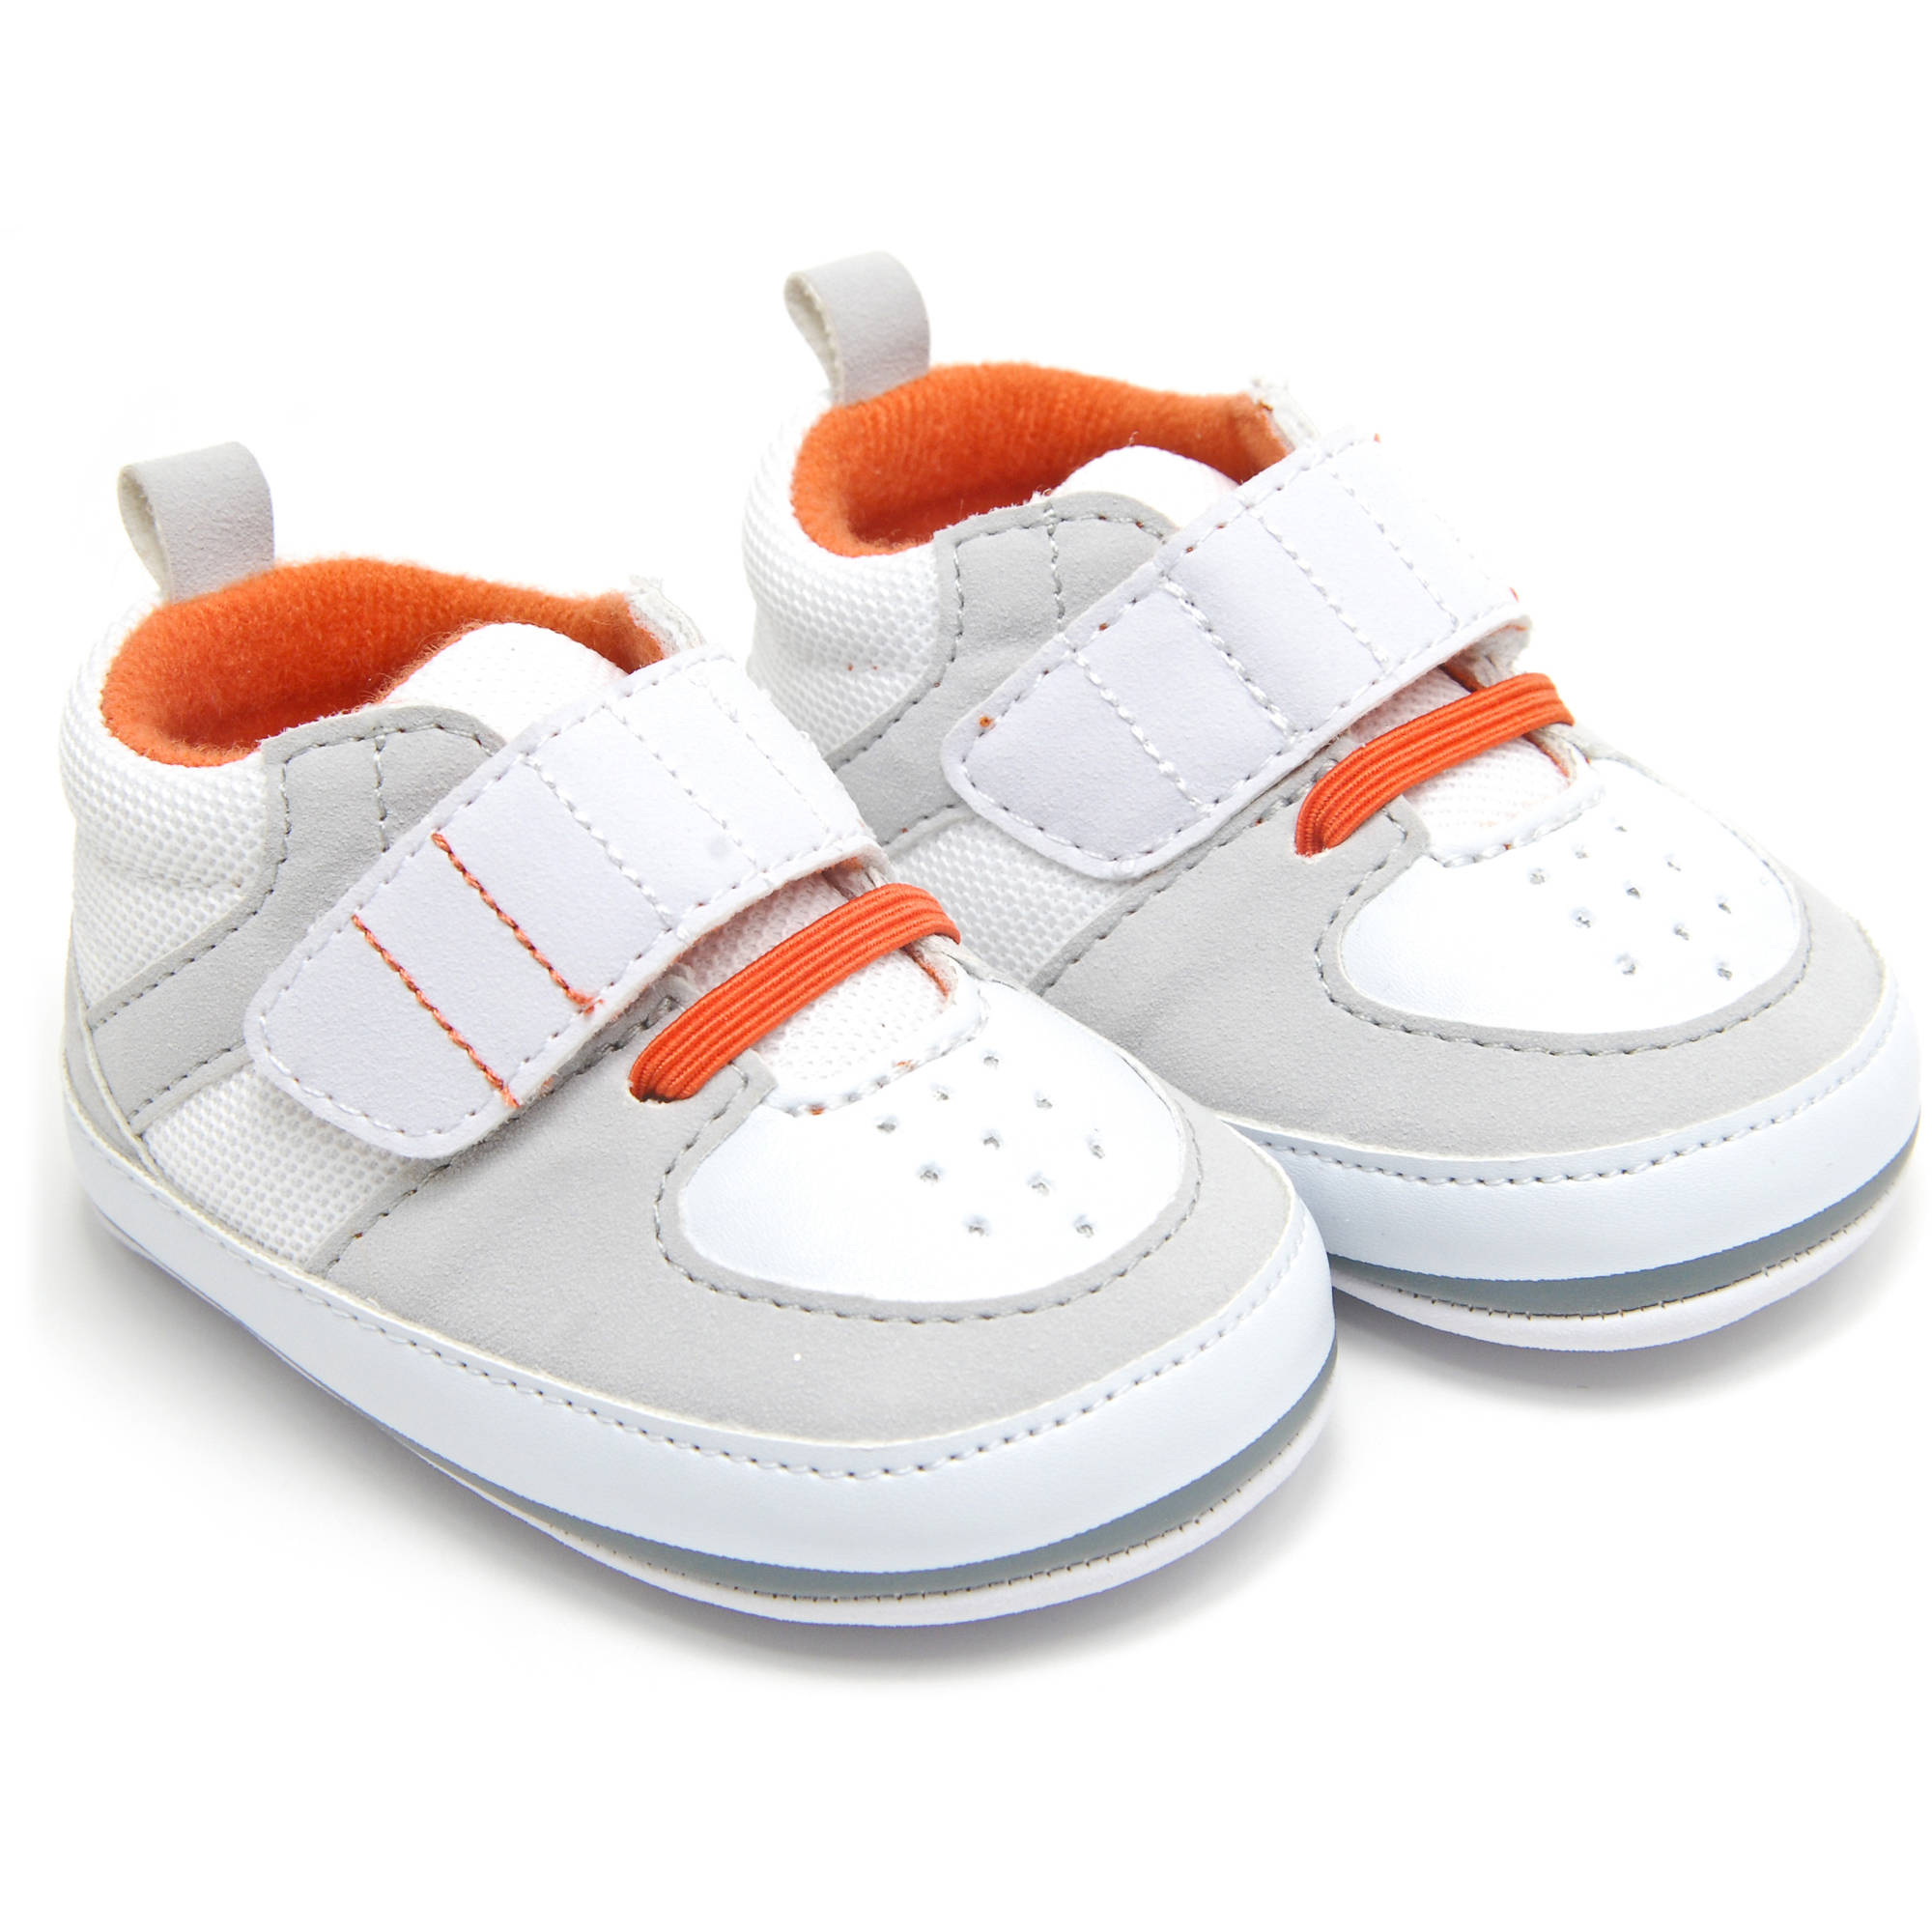 Child of Mine Baby Boys' Slip-On Sneakers